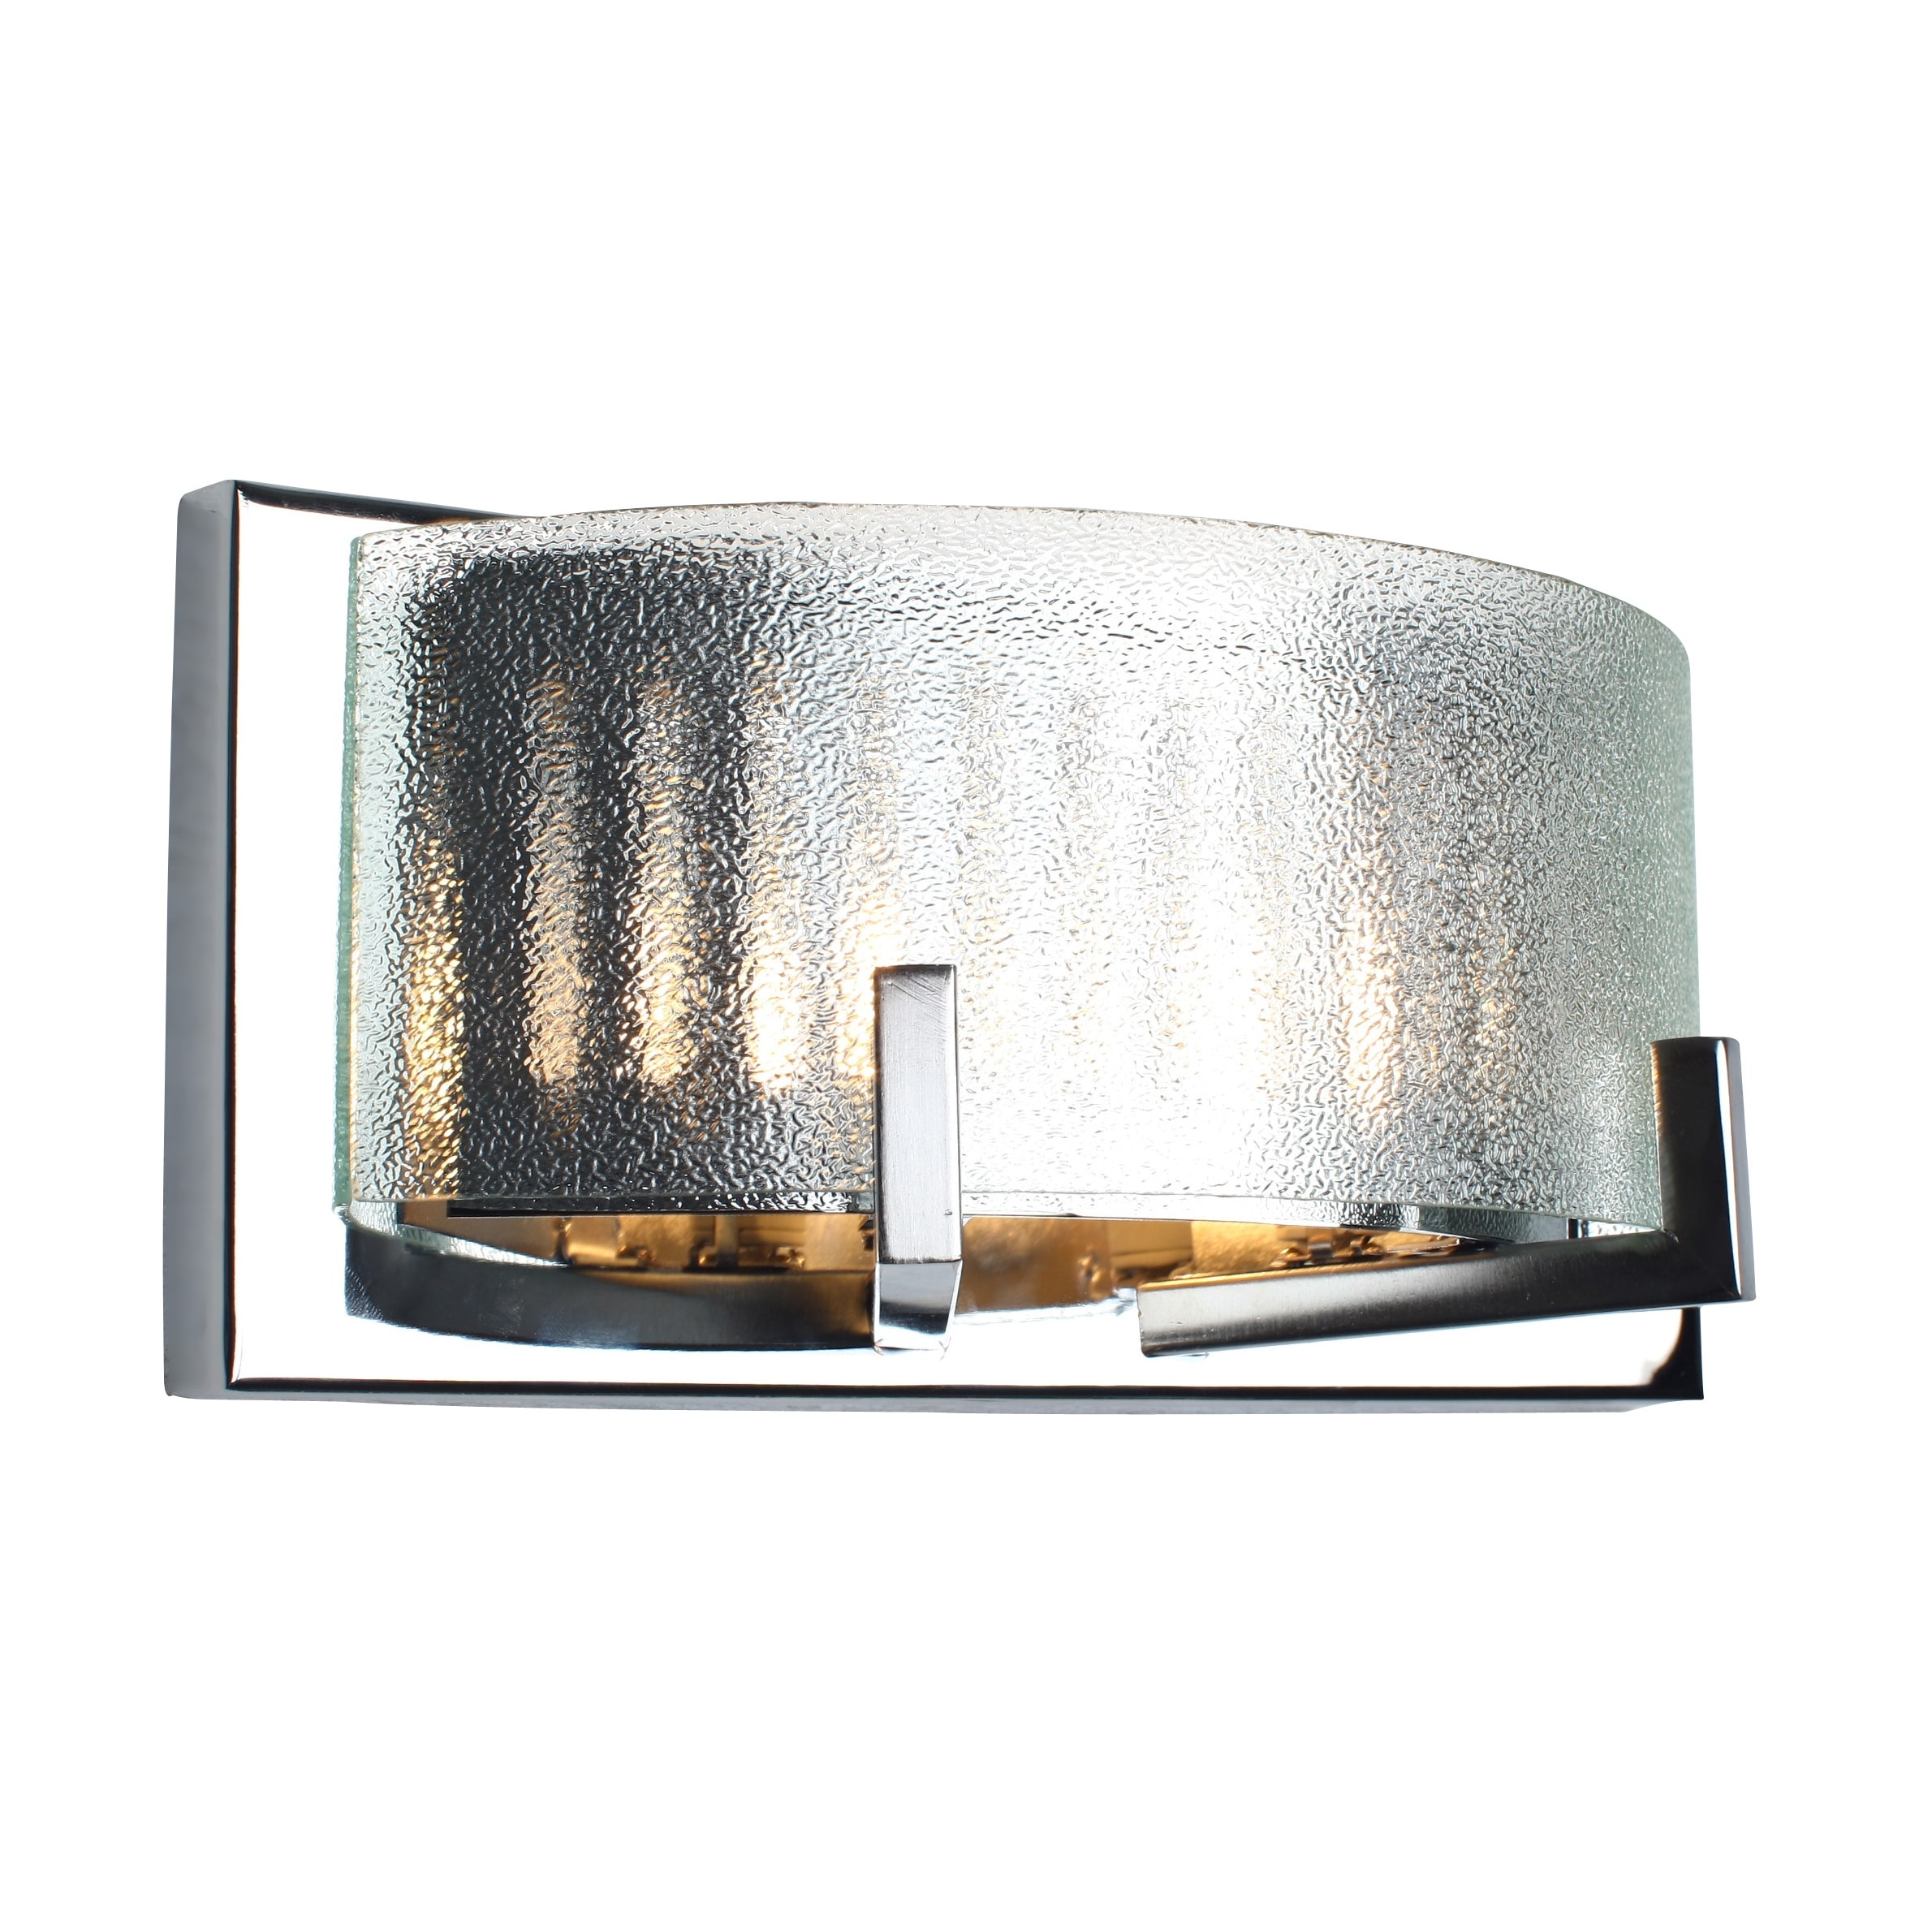 Alternating Current Firefly 2-light Chrome Vanity Fixture